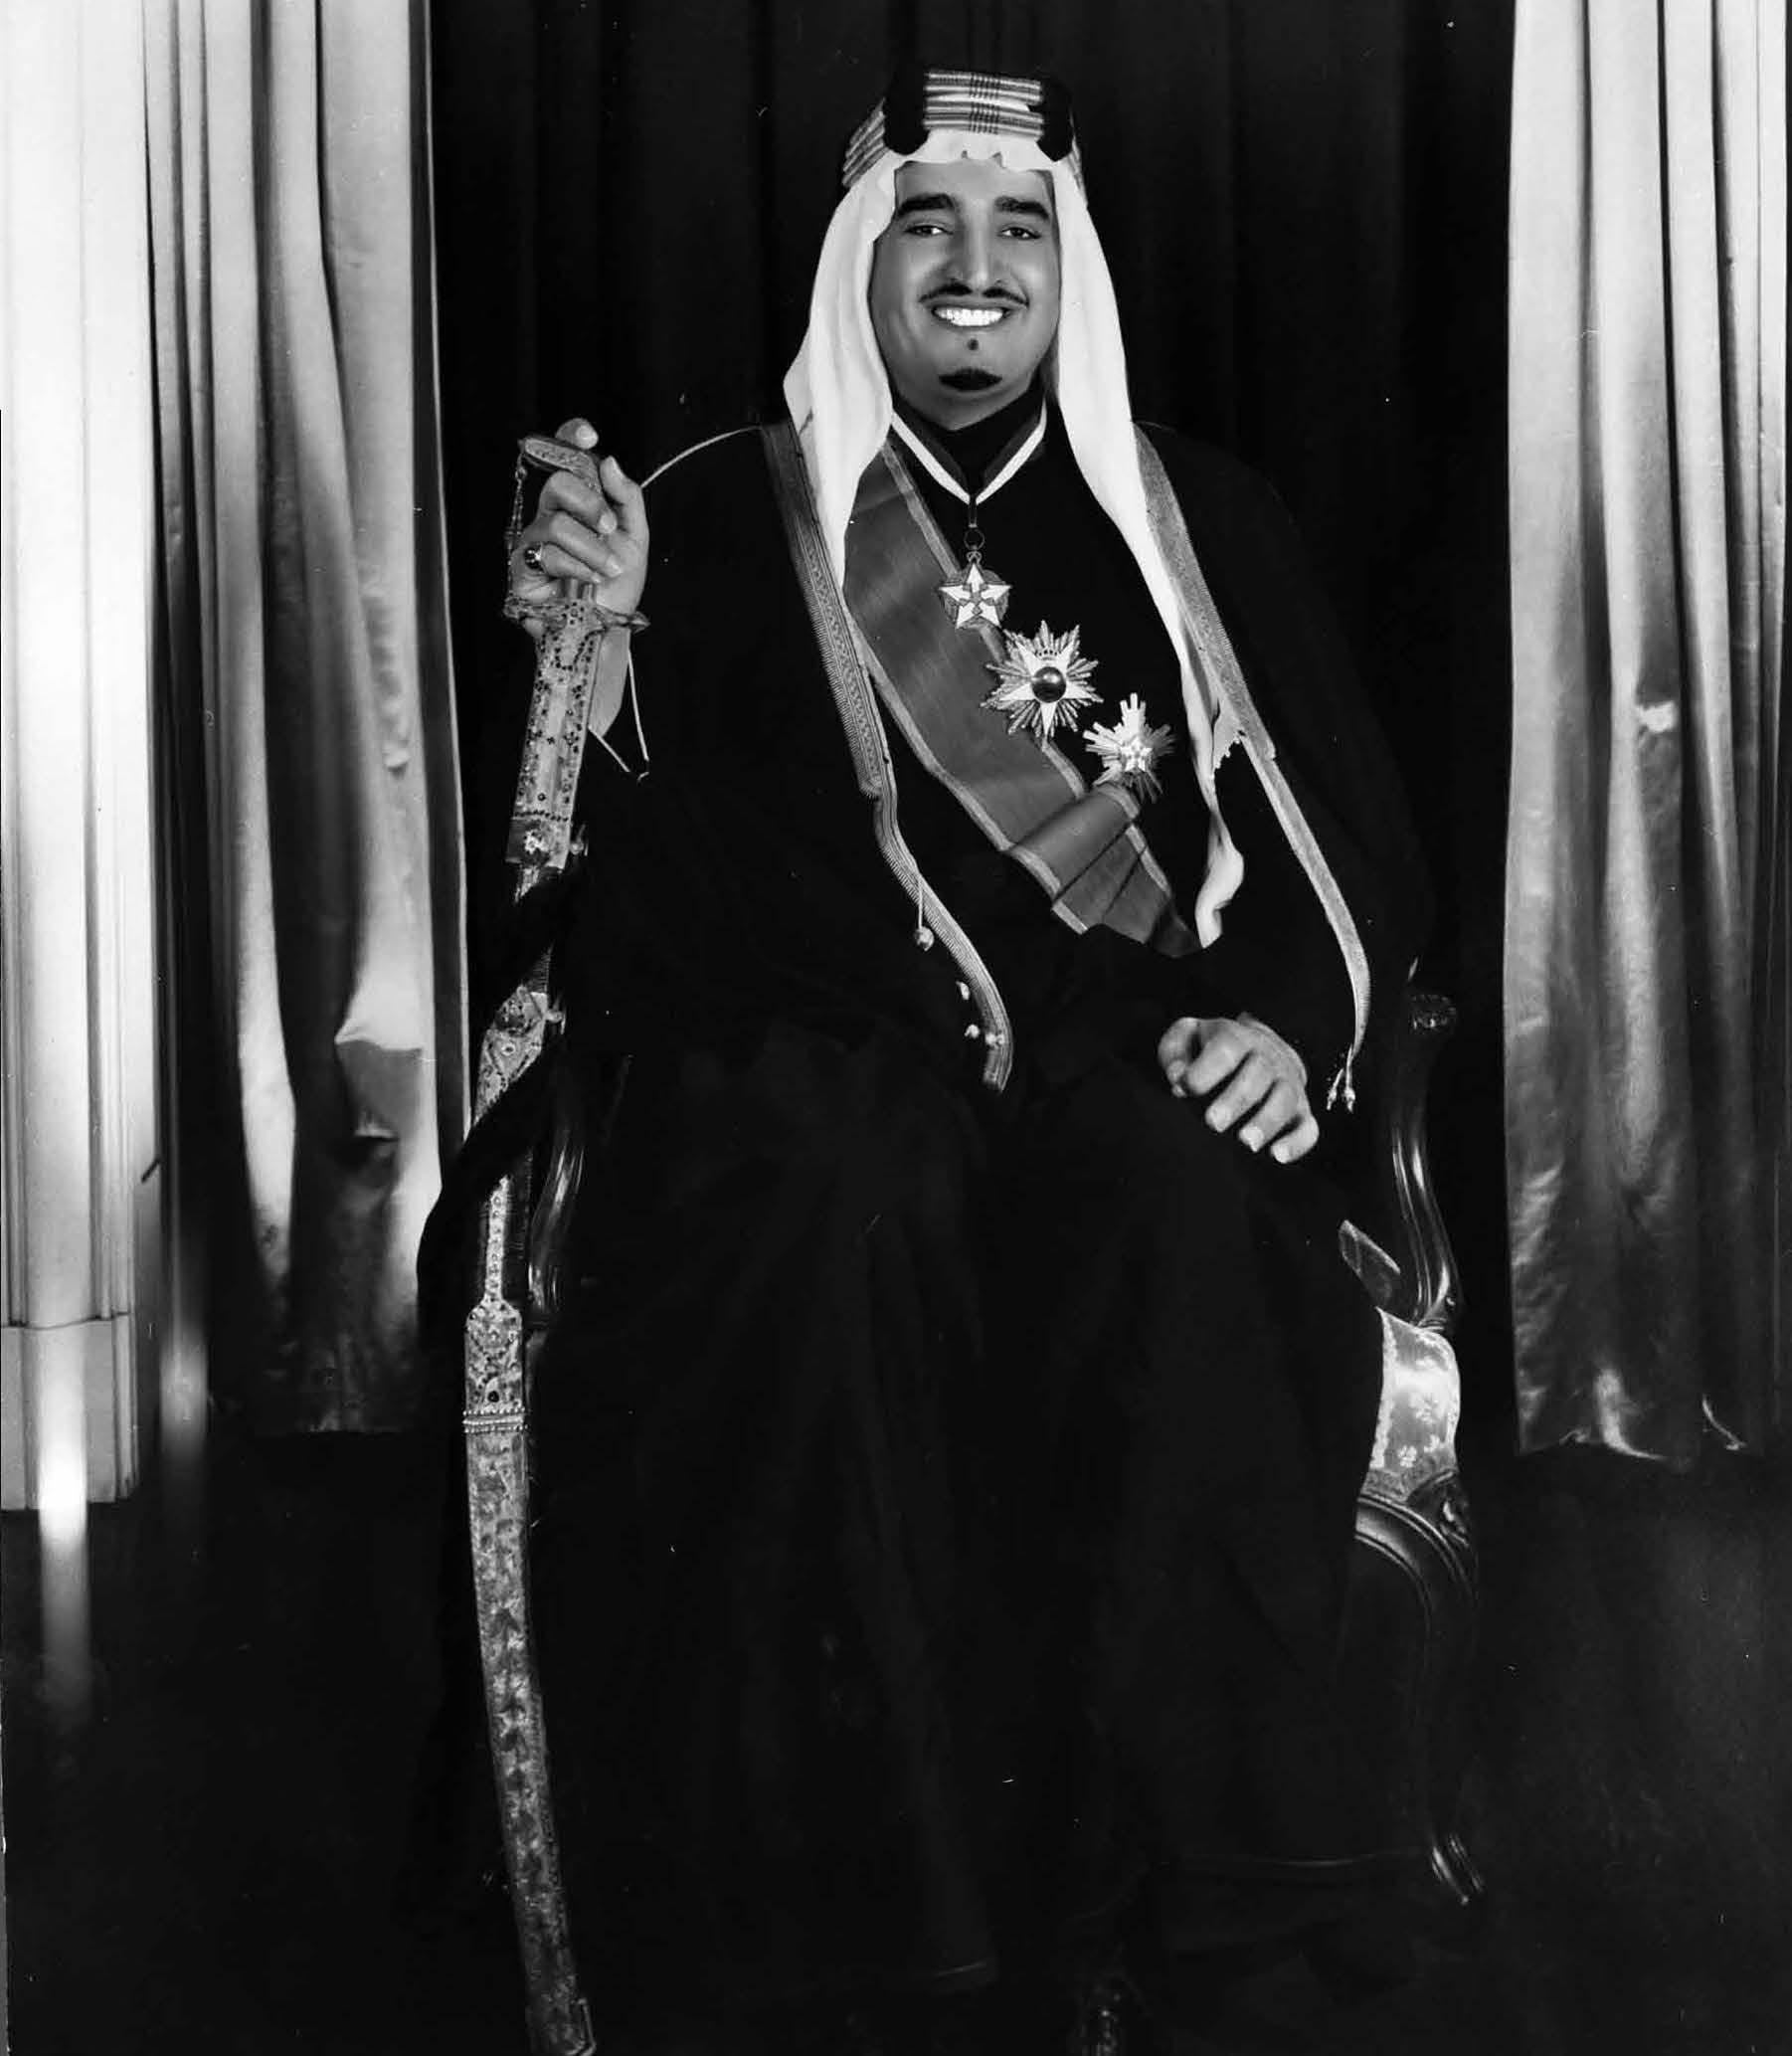 "صور نادرة للملك فهد في ""كتاب"" Cfd6e524-cb08-4f10-a811-cf7aa4de3842"